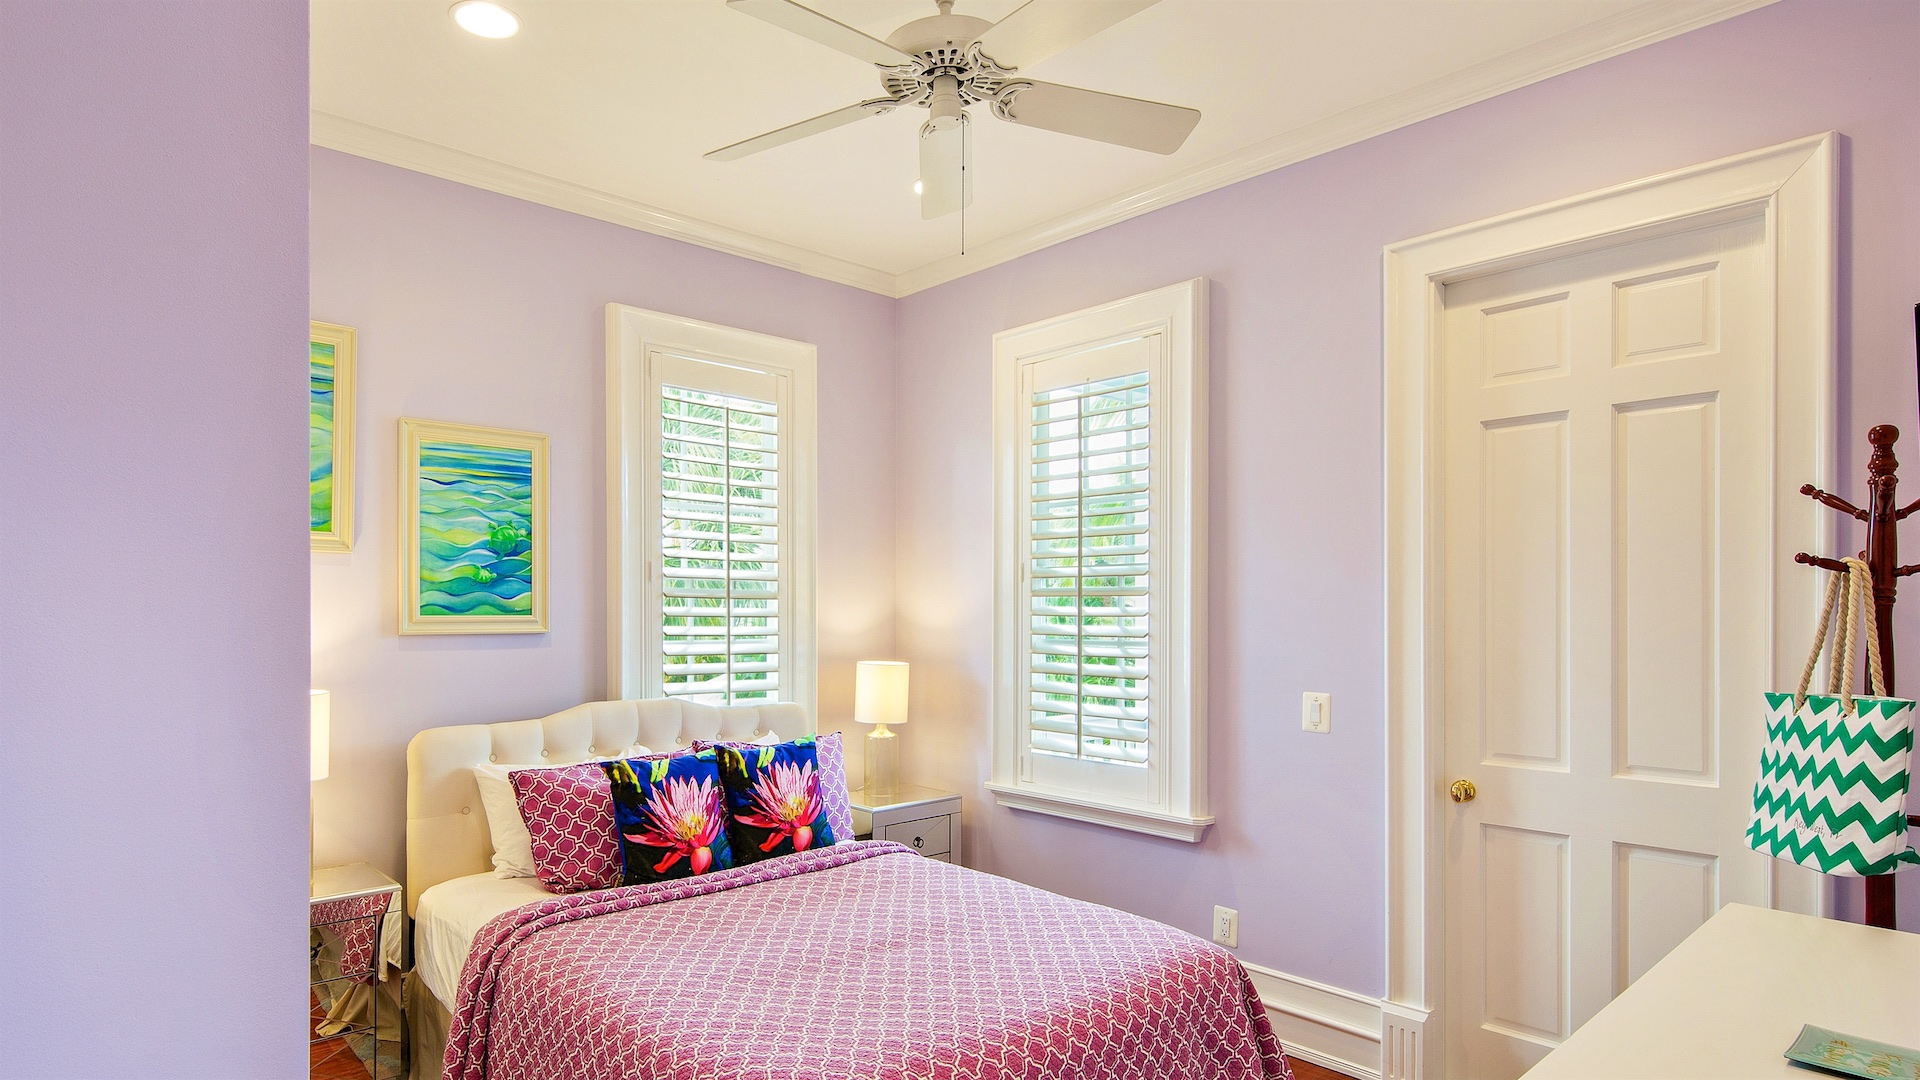 Noona S Mansion Vacation Rental In Key West Fl Last